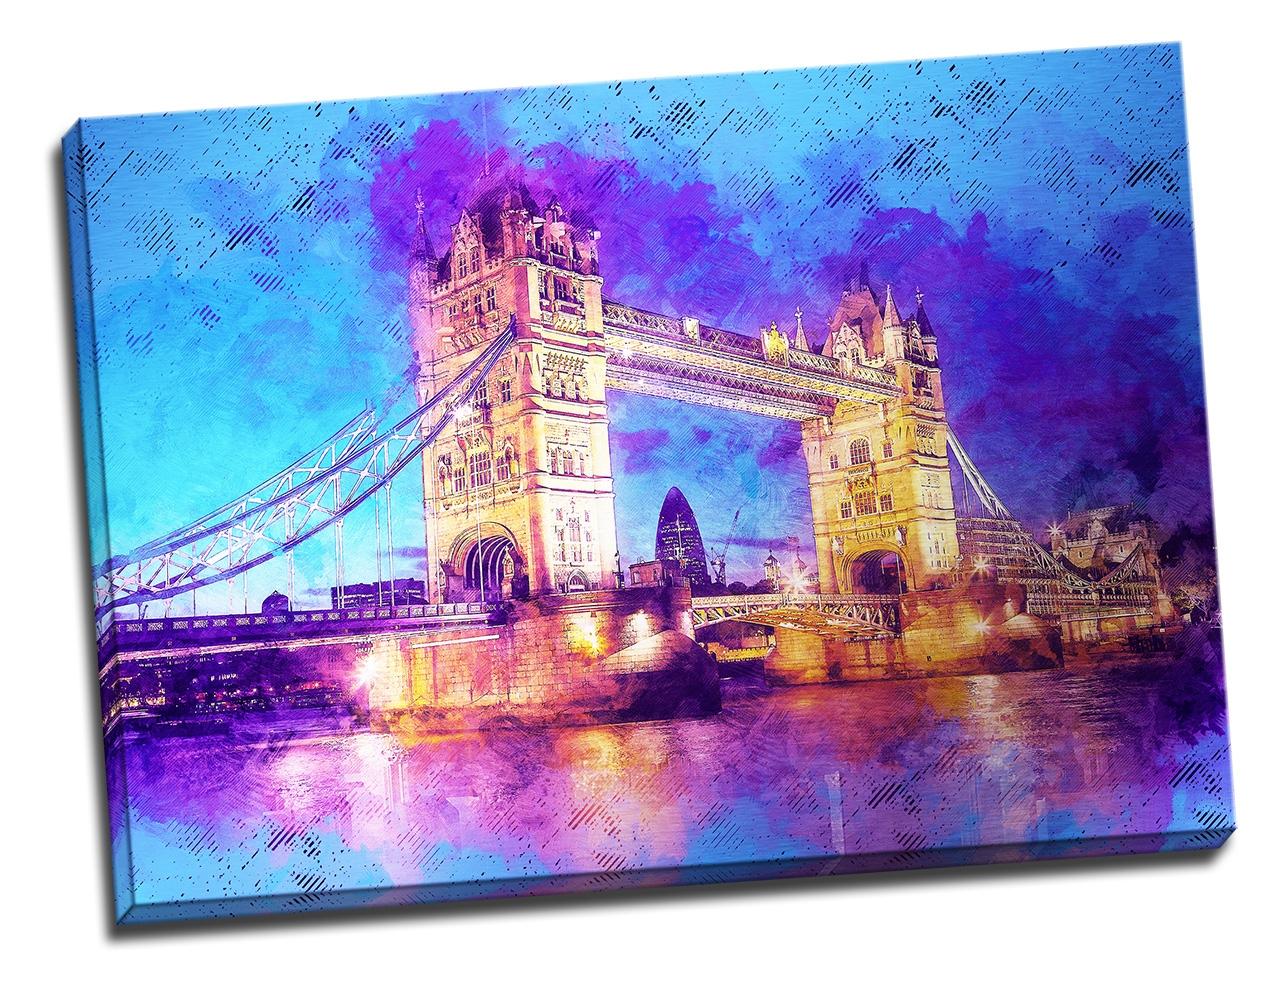 Tablou din aluminiu striat The Tower Bridge